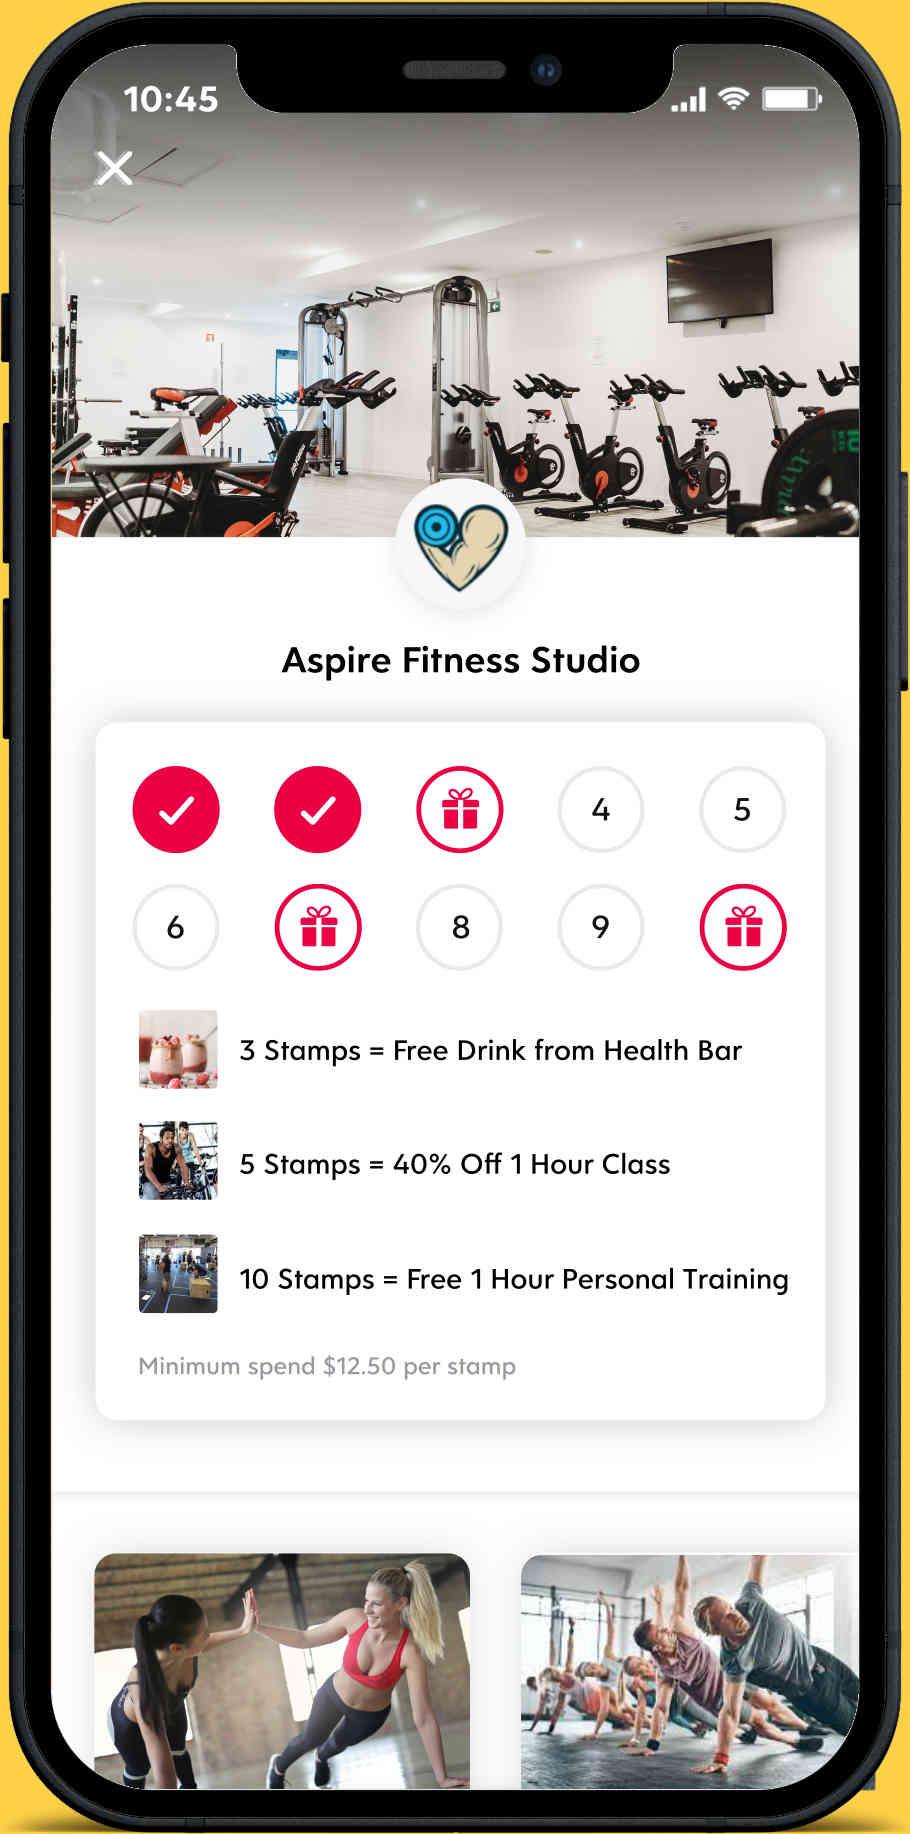 Flex Rewards Screenshot of Digital Loyalty Program for Aspire Fitness Studio